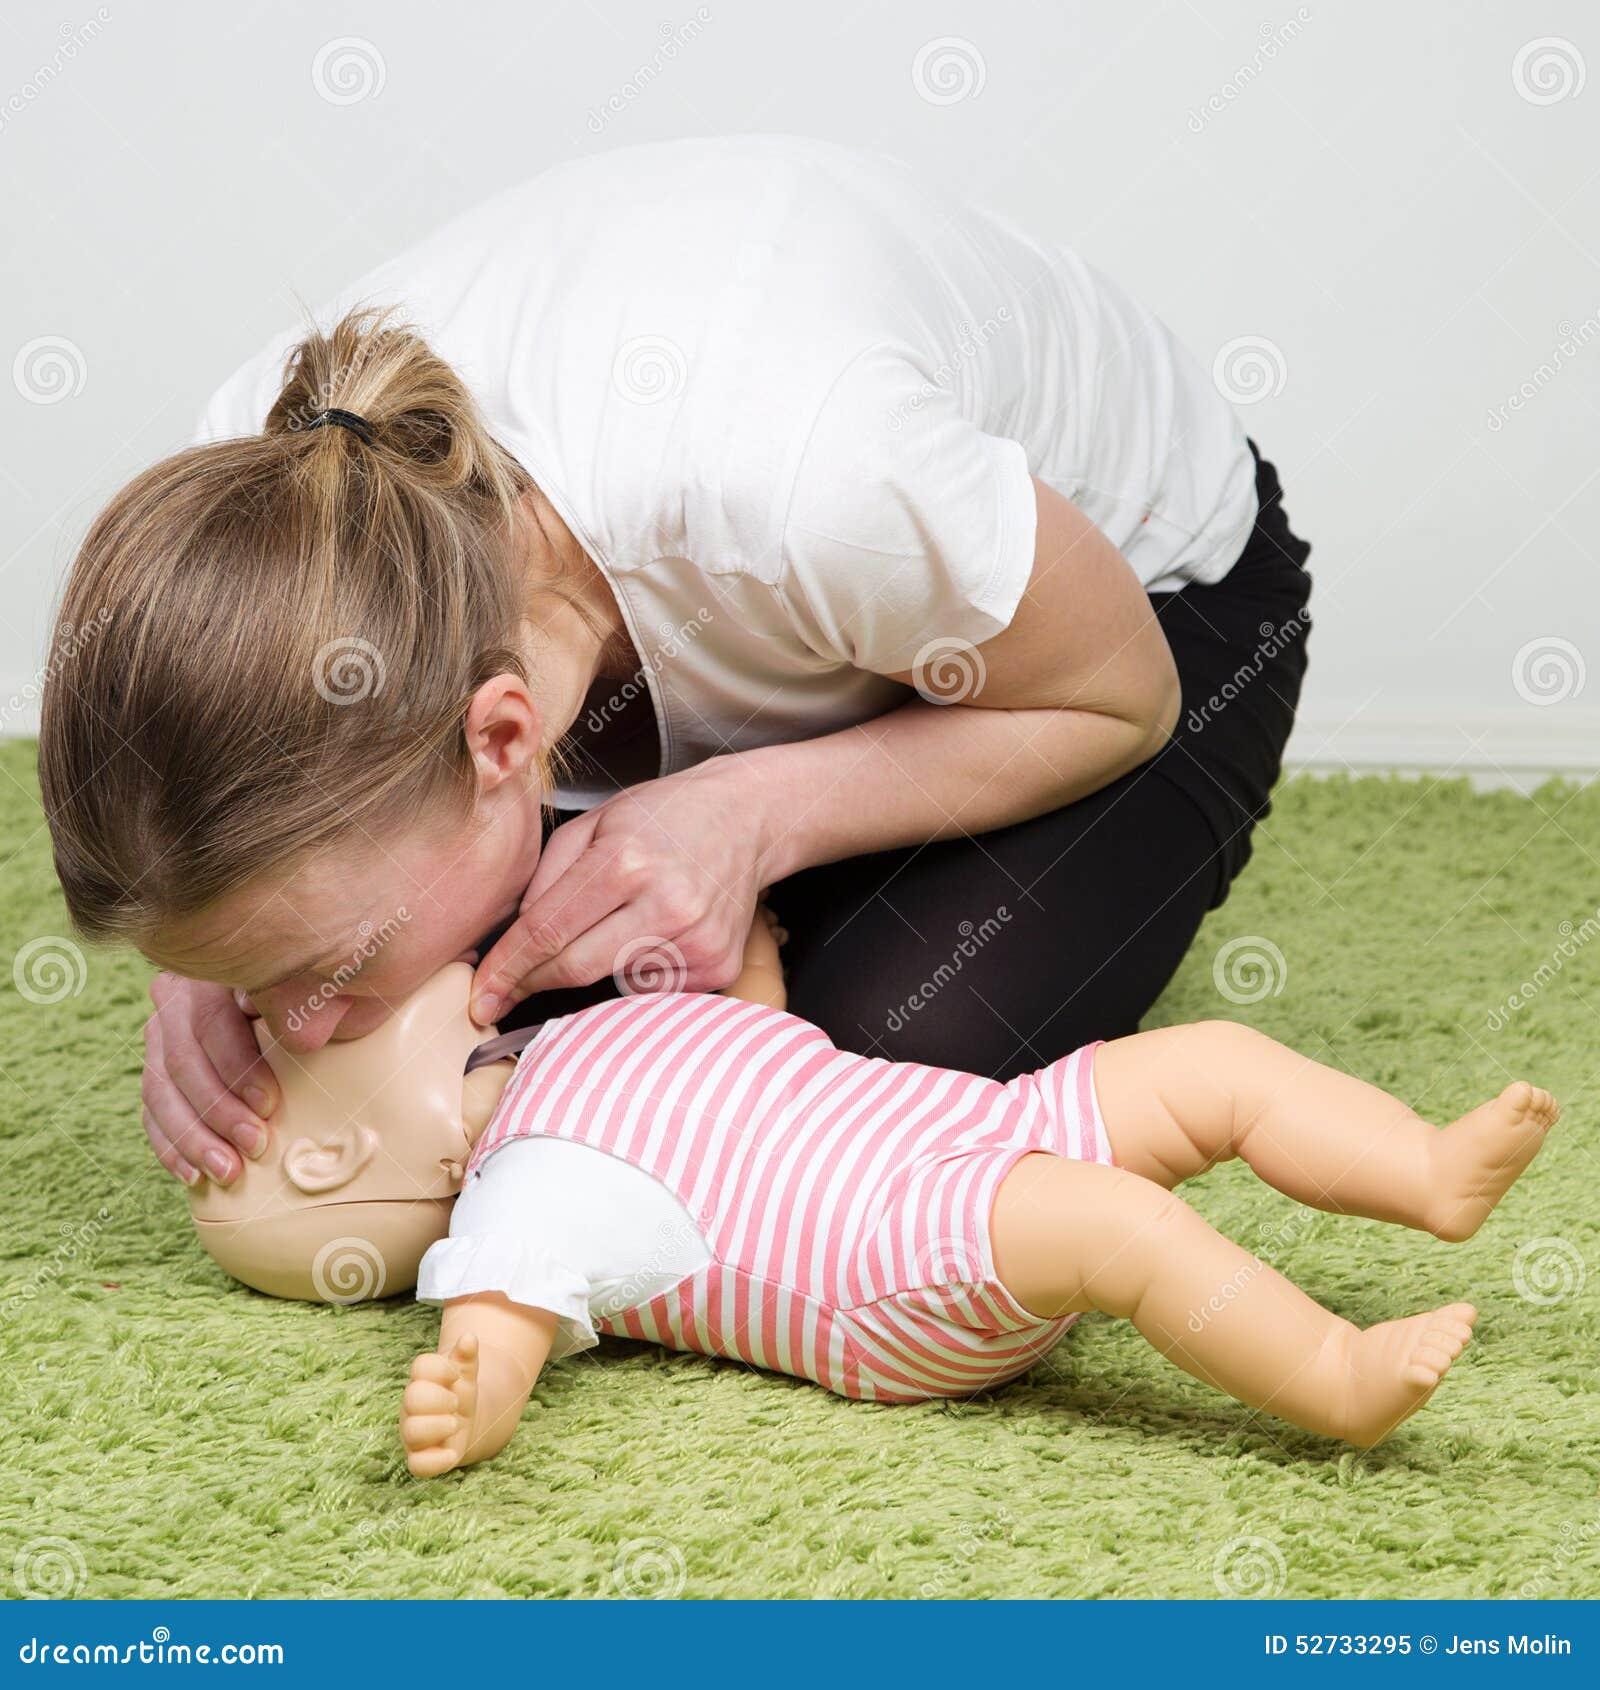 Infant CPR breathing.